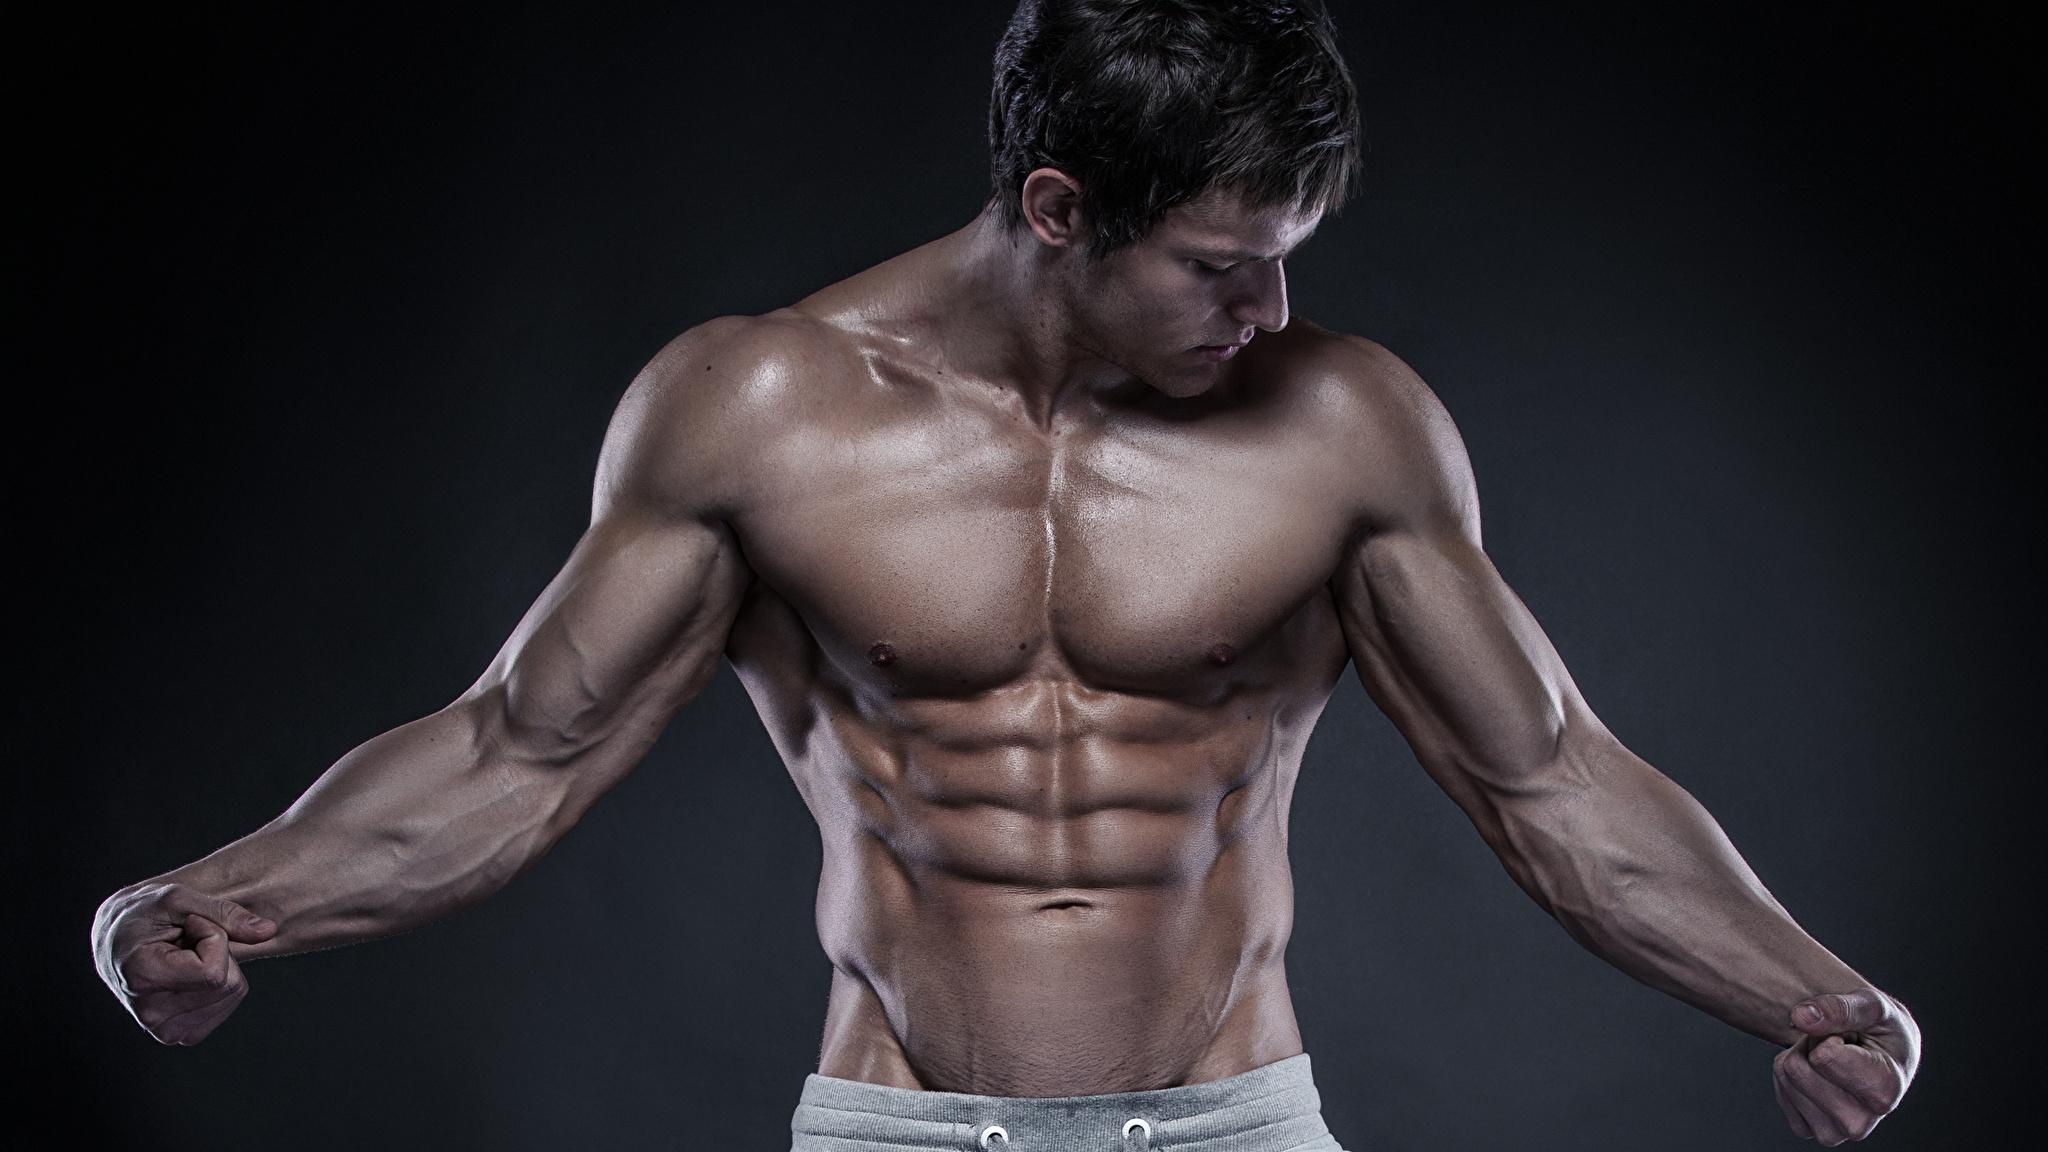 Красивое мужское тело в домашних условиях :: syl.ru